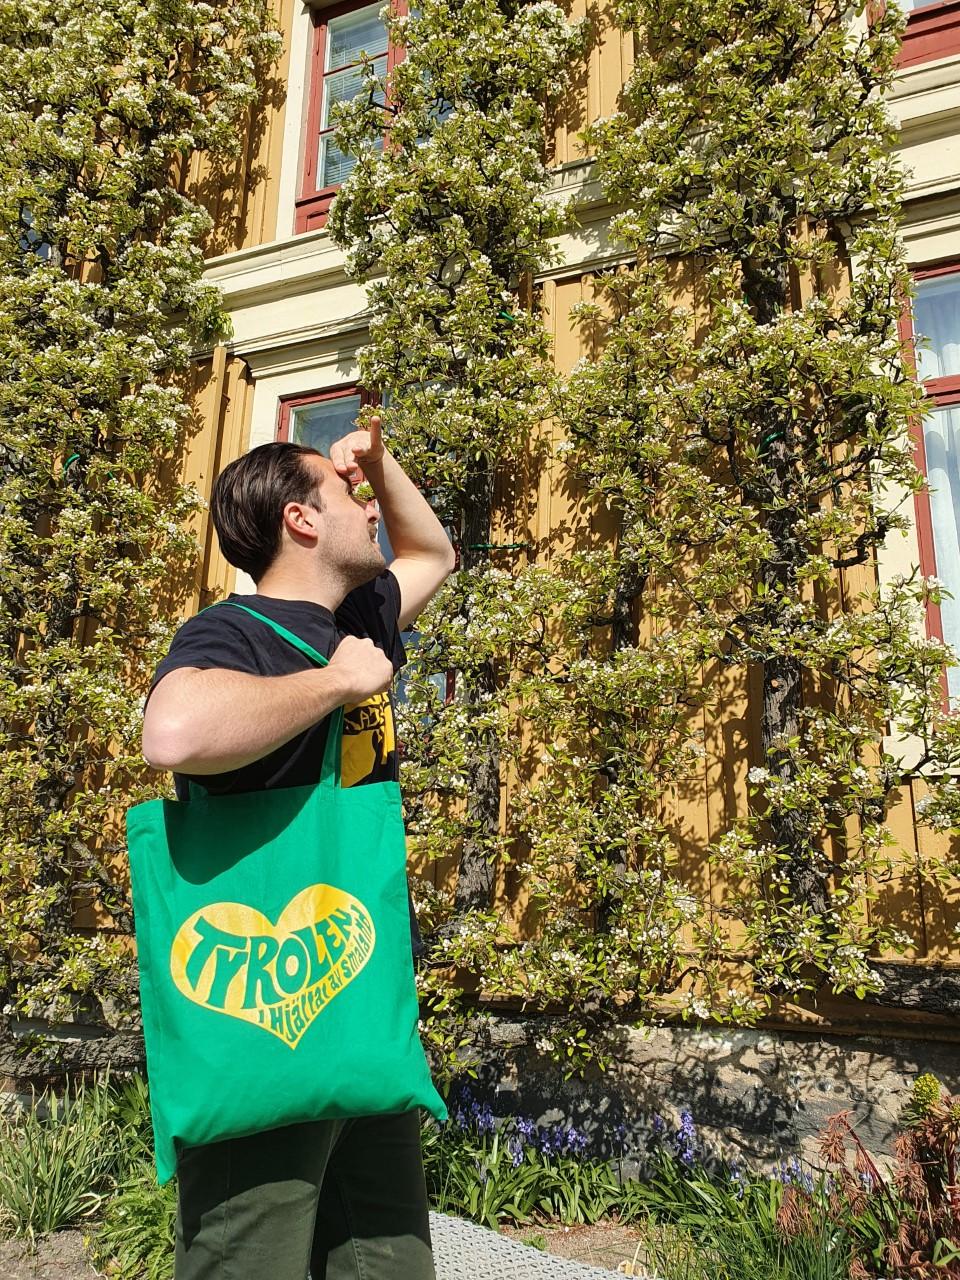 Tyrolen Tygkasse grön med gult tryck